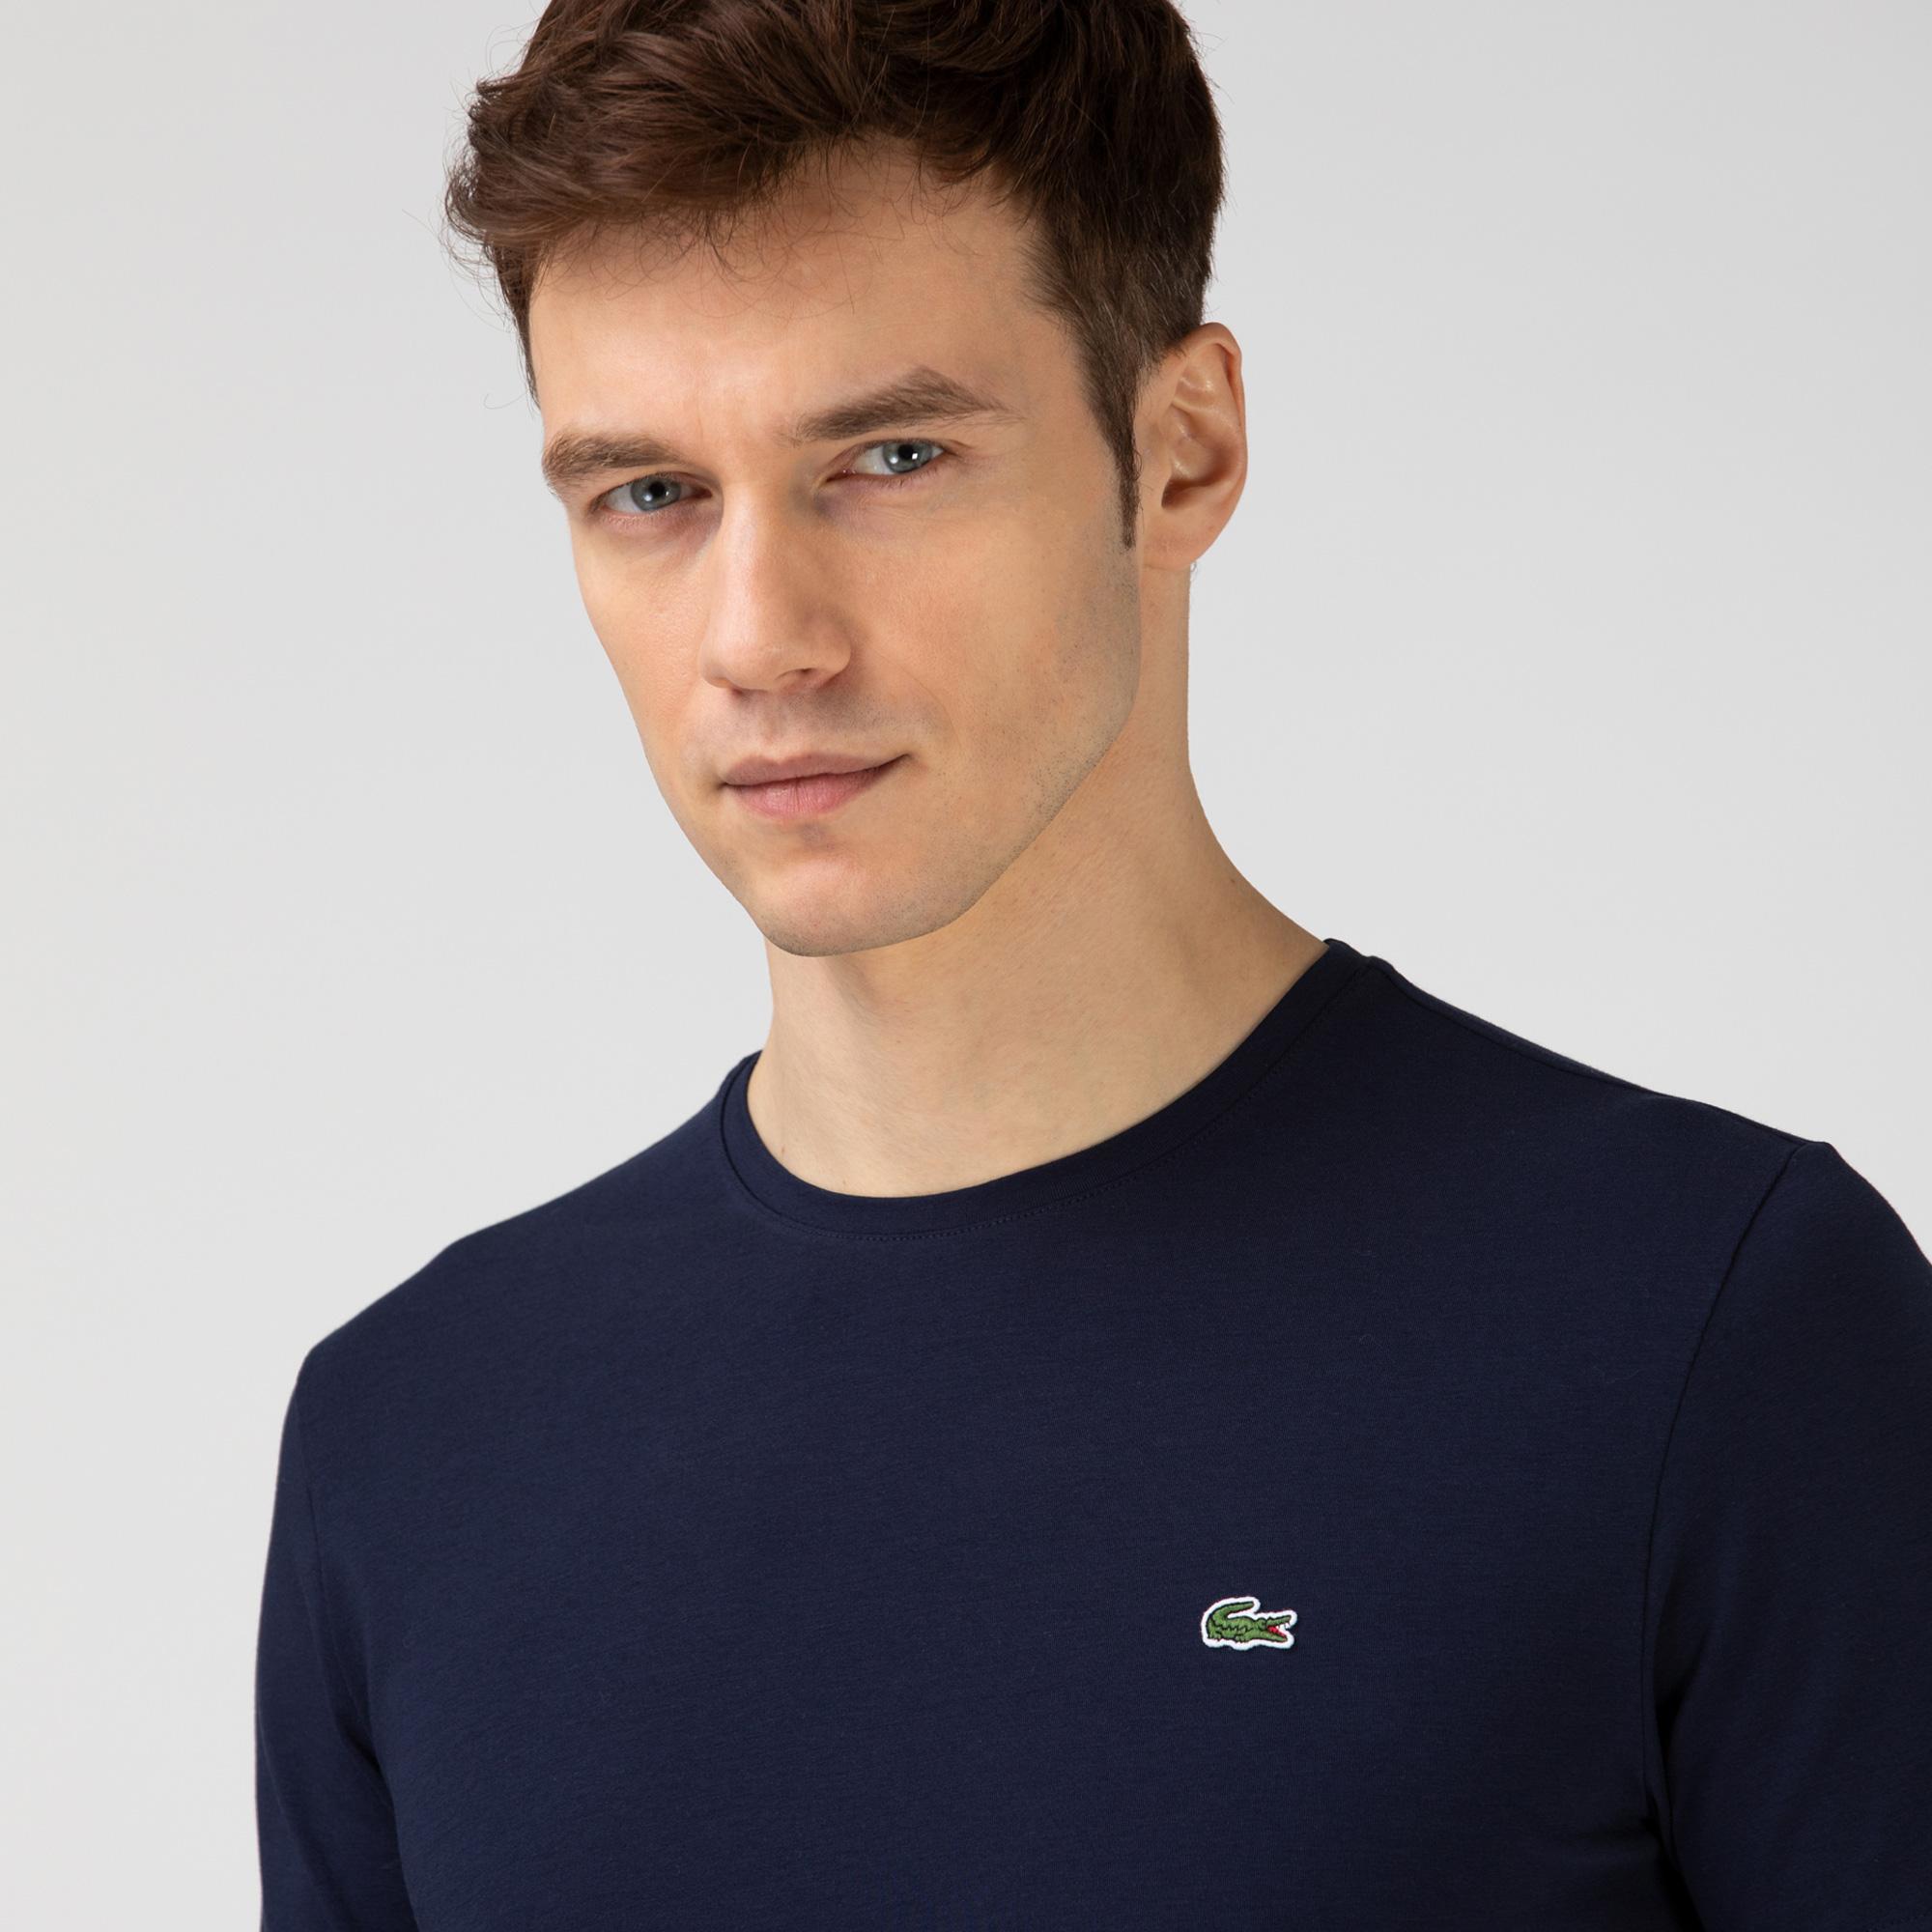 Lacoste Erkek Bisiklet Yaka Lacivert T-Shirt